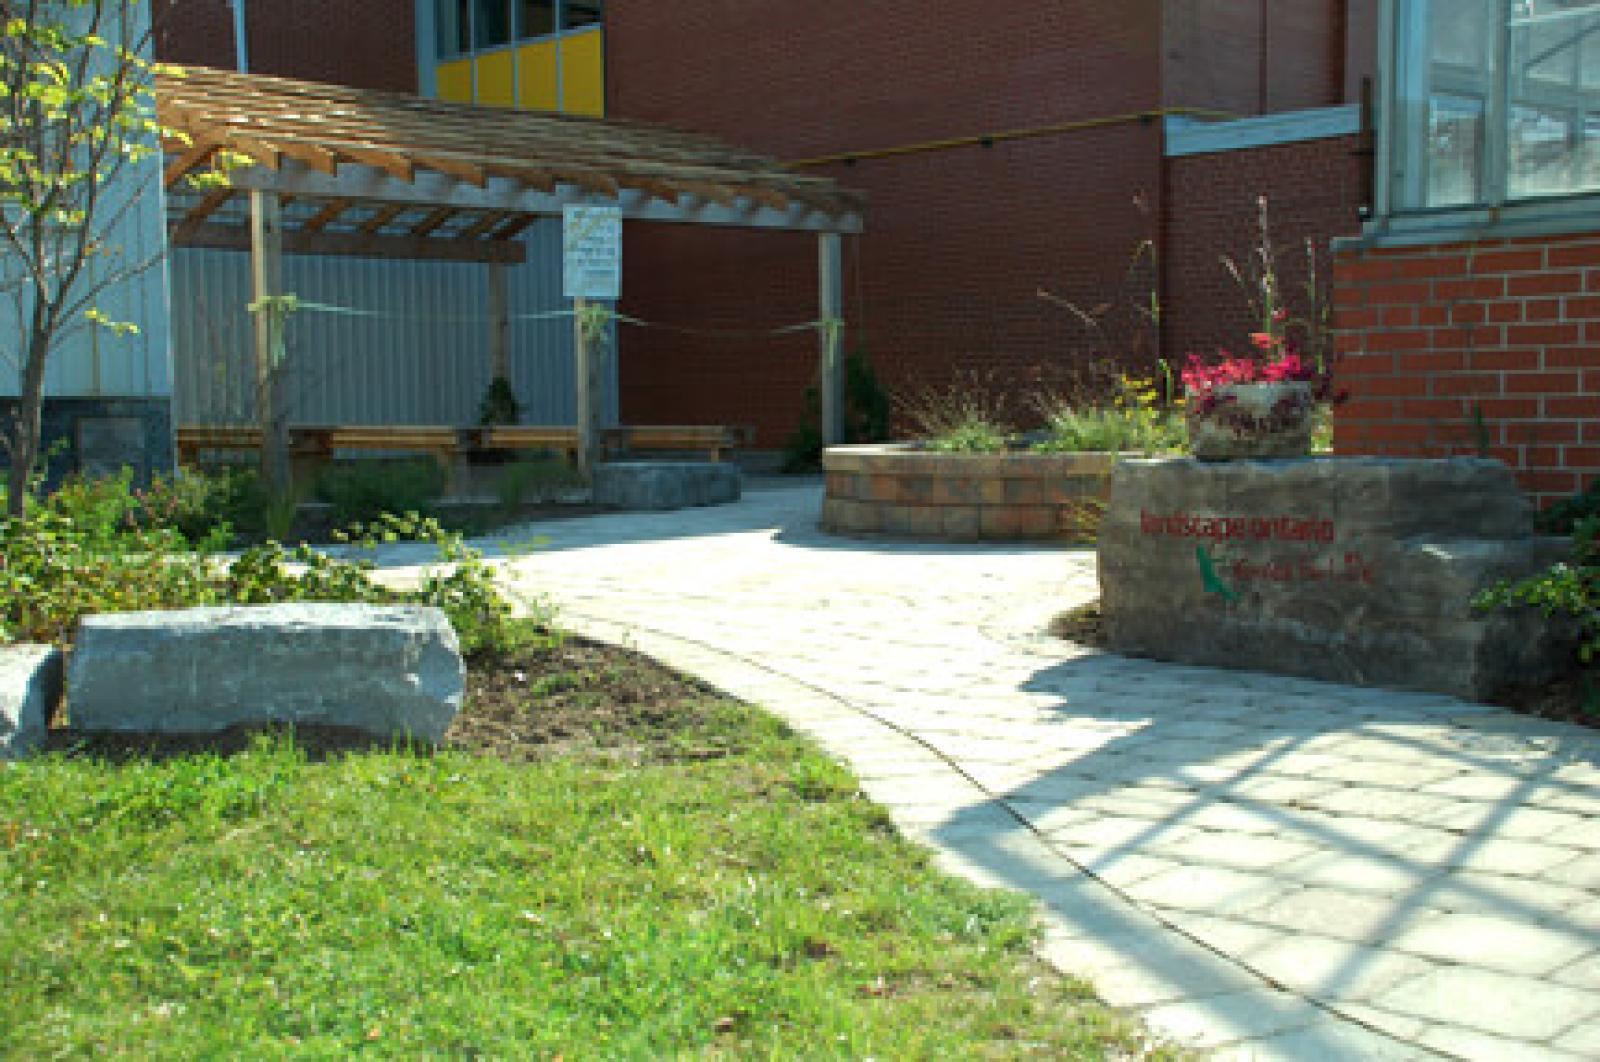 Waterloo's latest greening project creates outdoor classroom